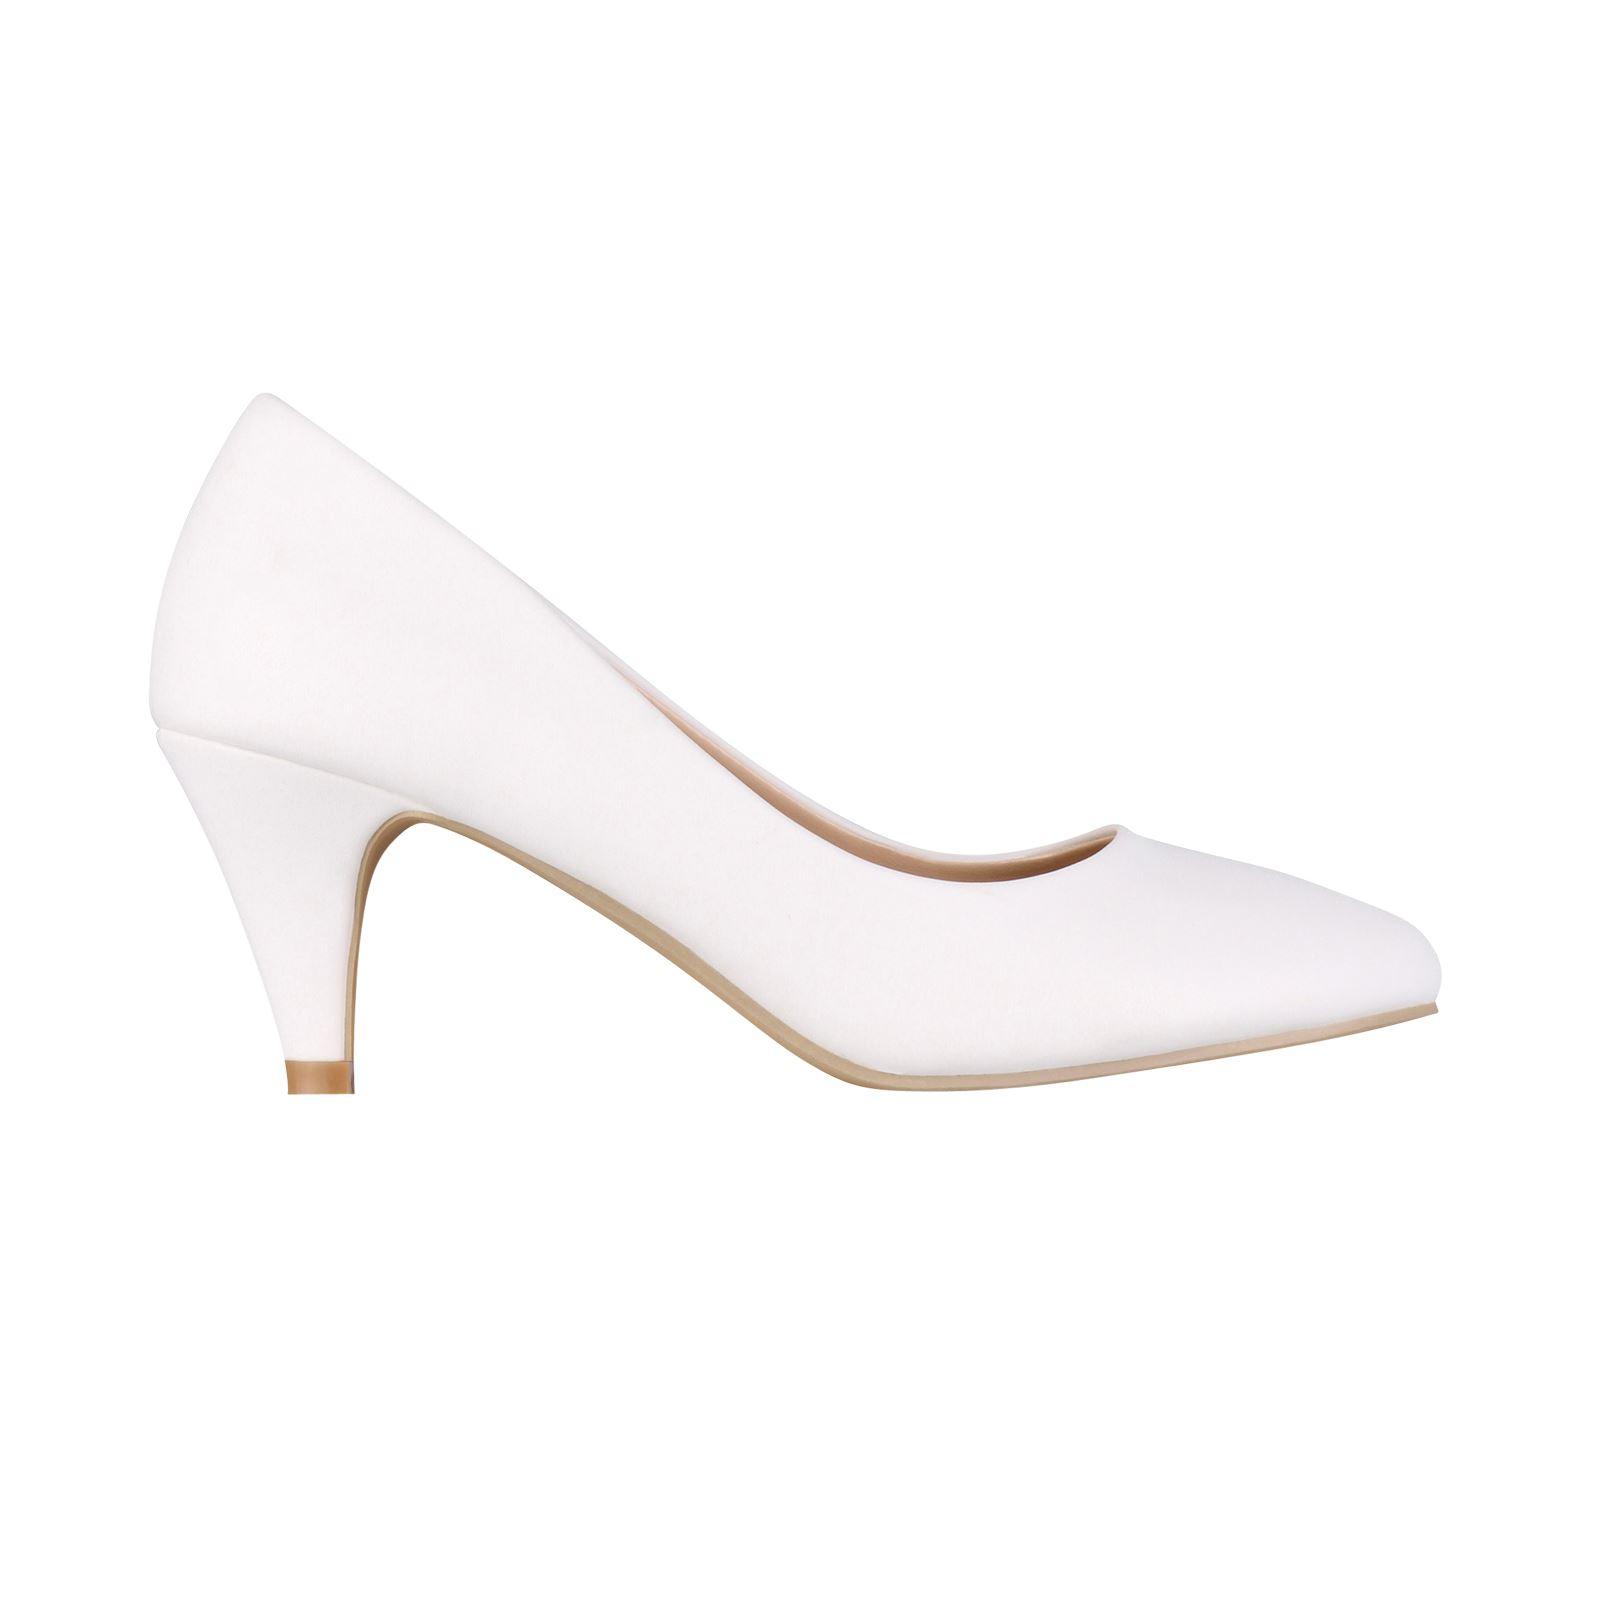 Womens-Ladies-Mid-Heel-Court-Shoes-Slip-On-Low-Kitten-Heels-Pumps-Matte-Size-3-8 thumbnail 23